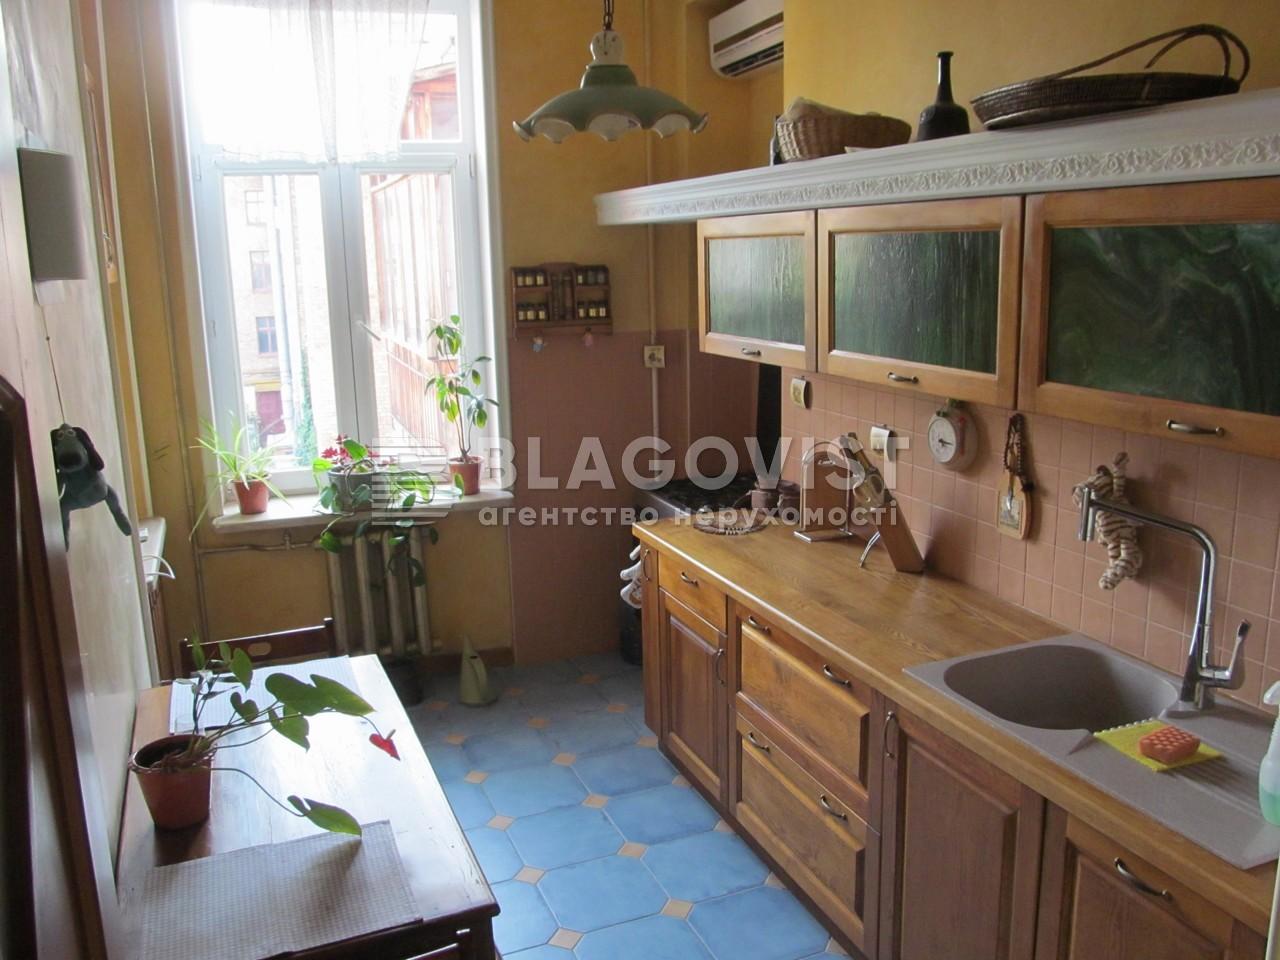 Квартира C-103021, Деловая (Димитрова), 13, Киев - Фото 8